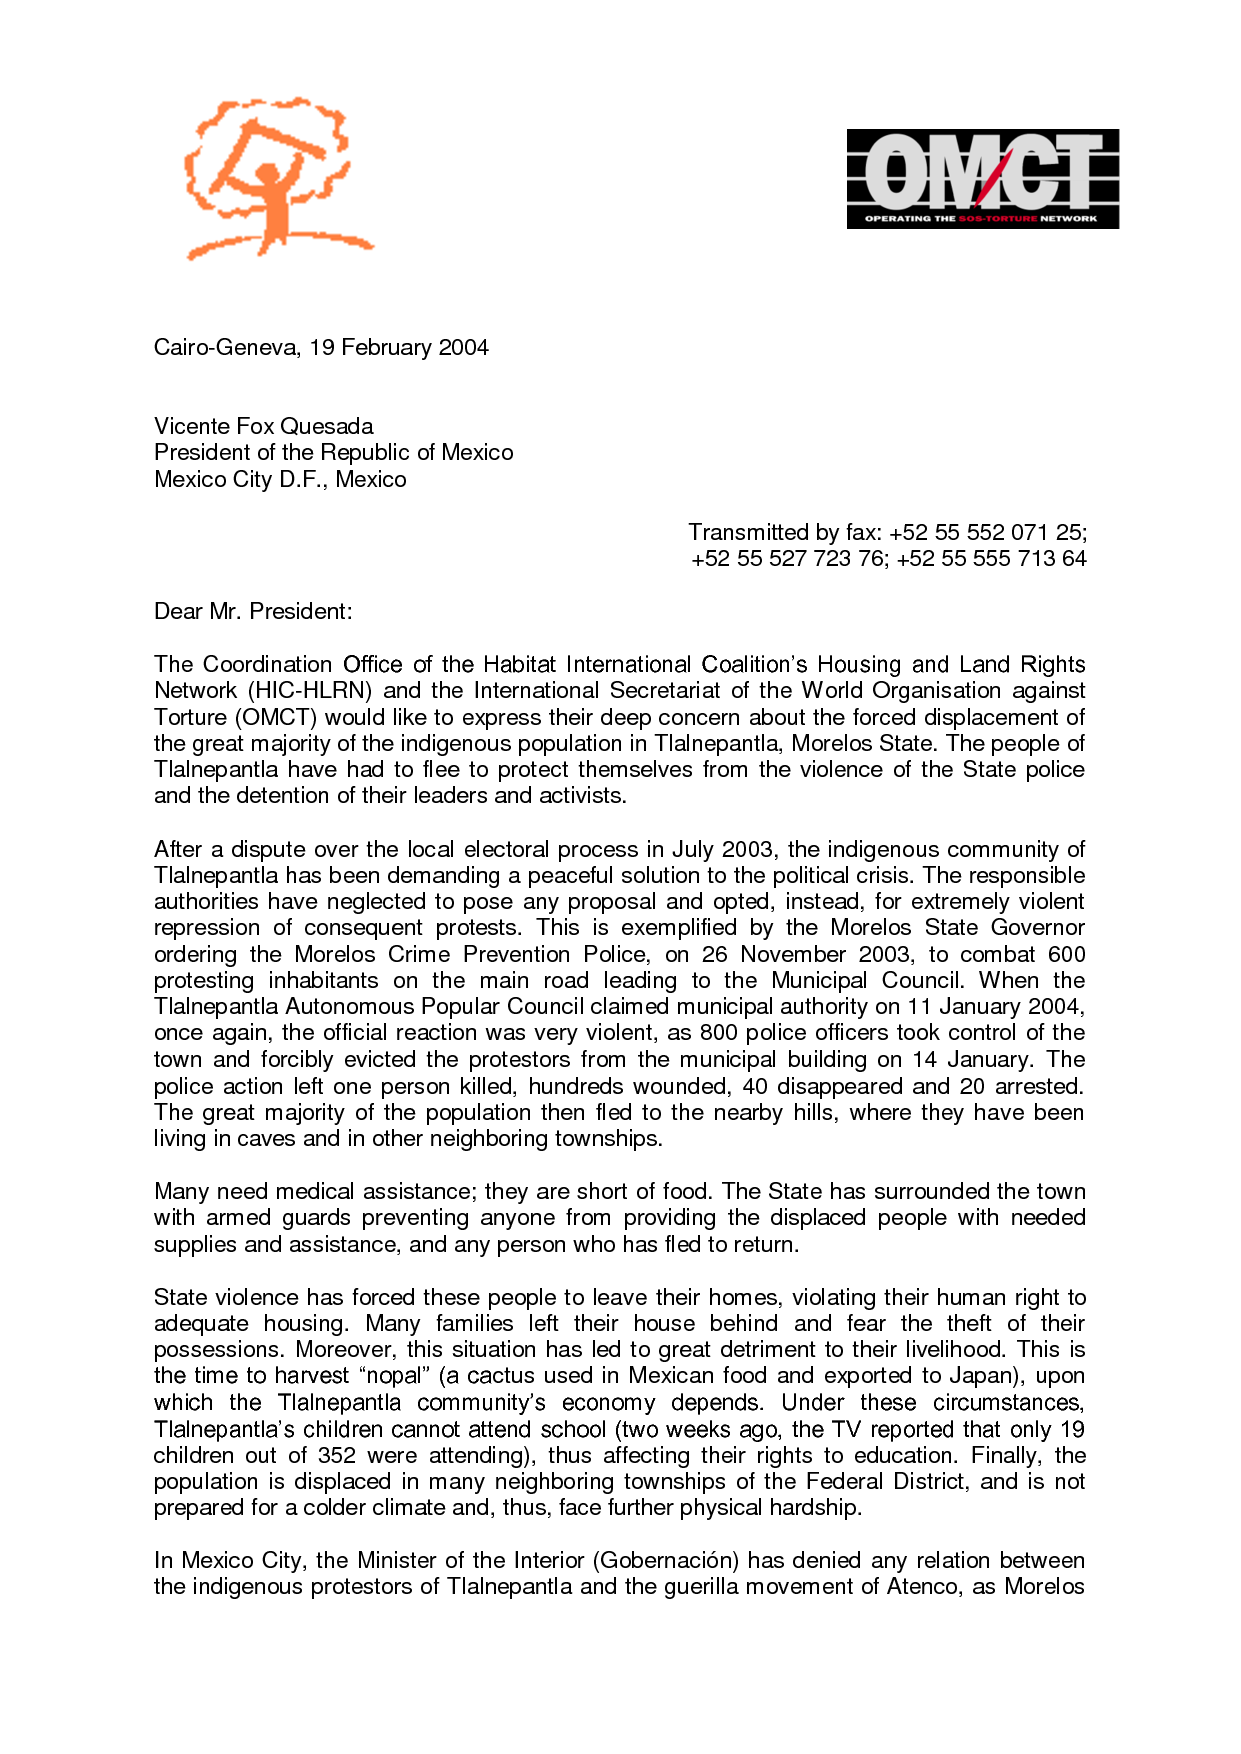 Formal government letter format sample formal letter spm writing spiritdancerdesigns Image collections